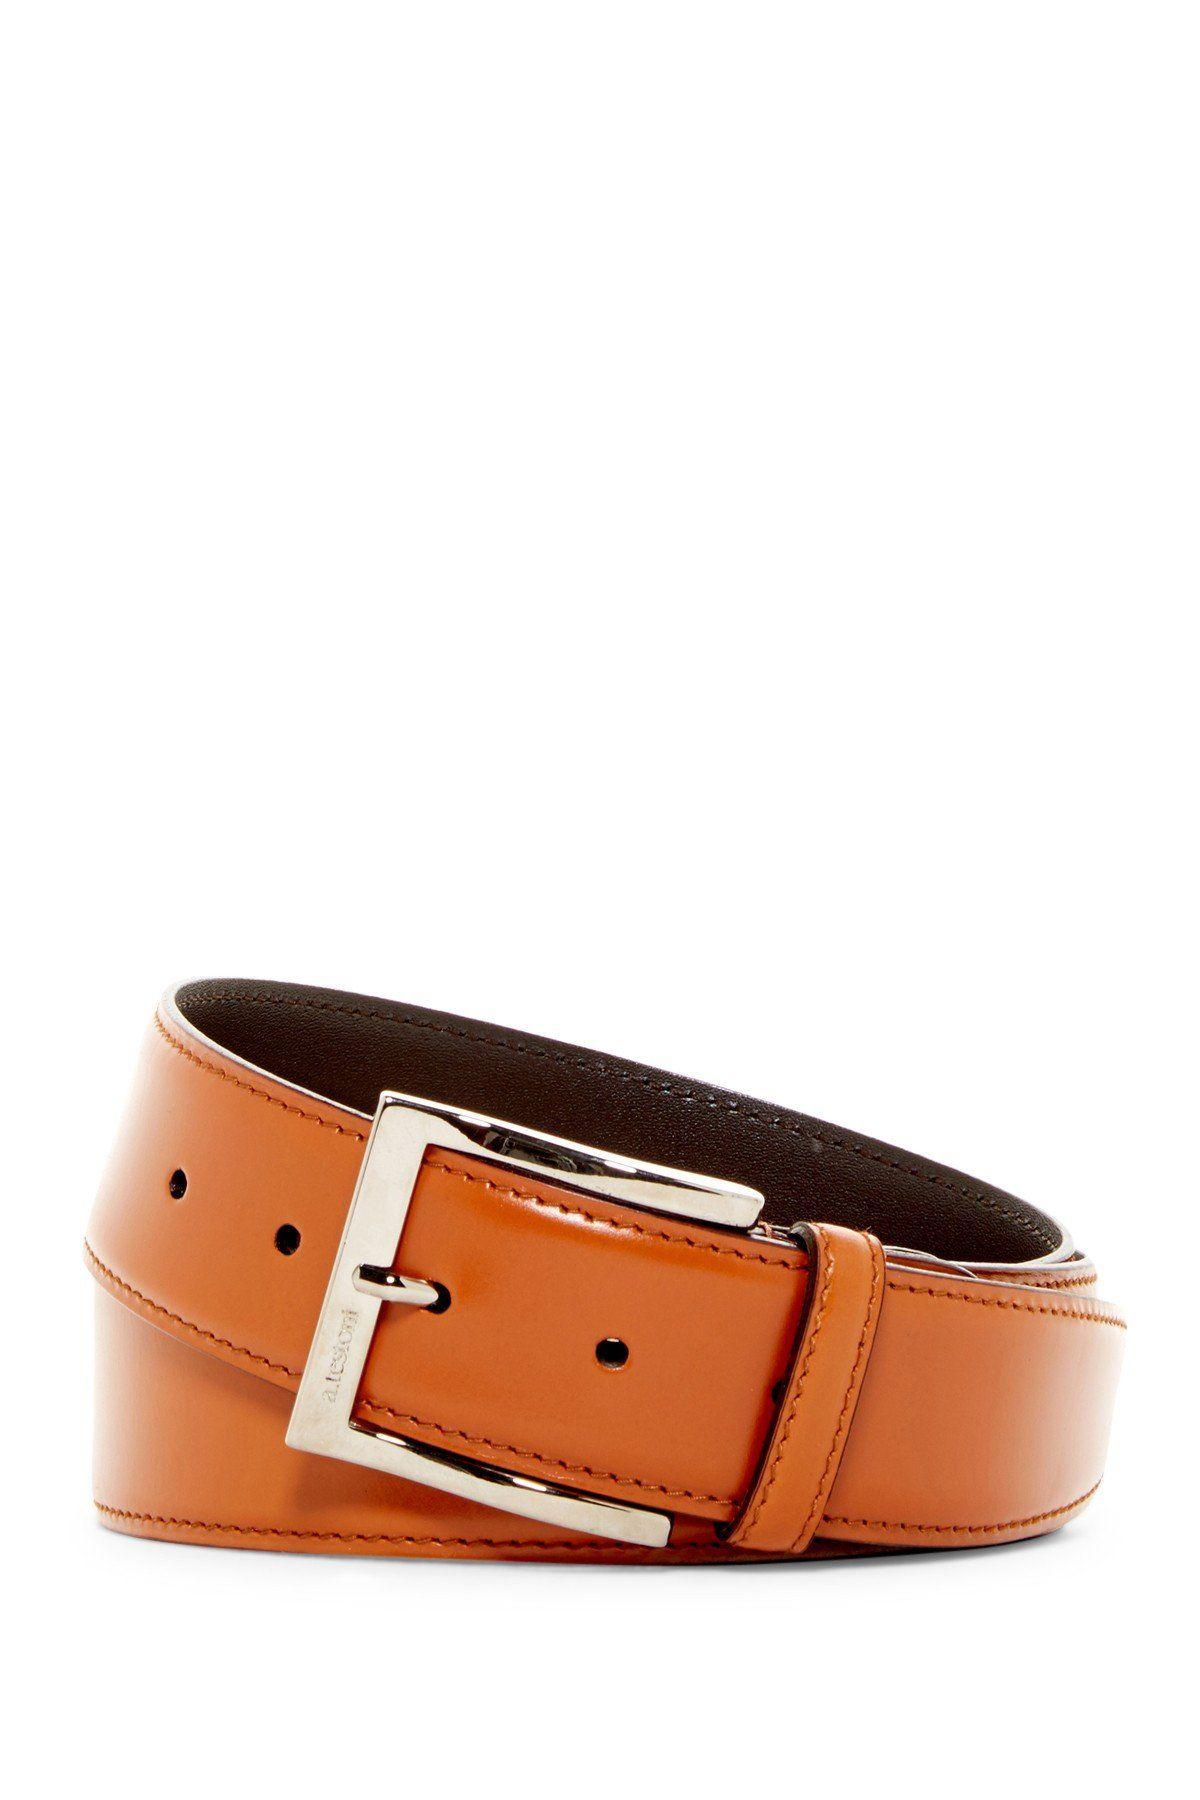 Lux Calf Leather Belt